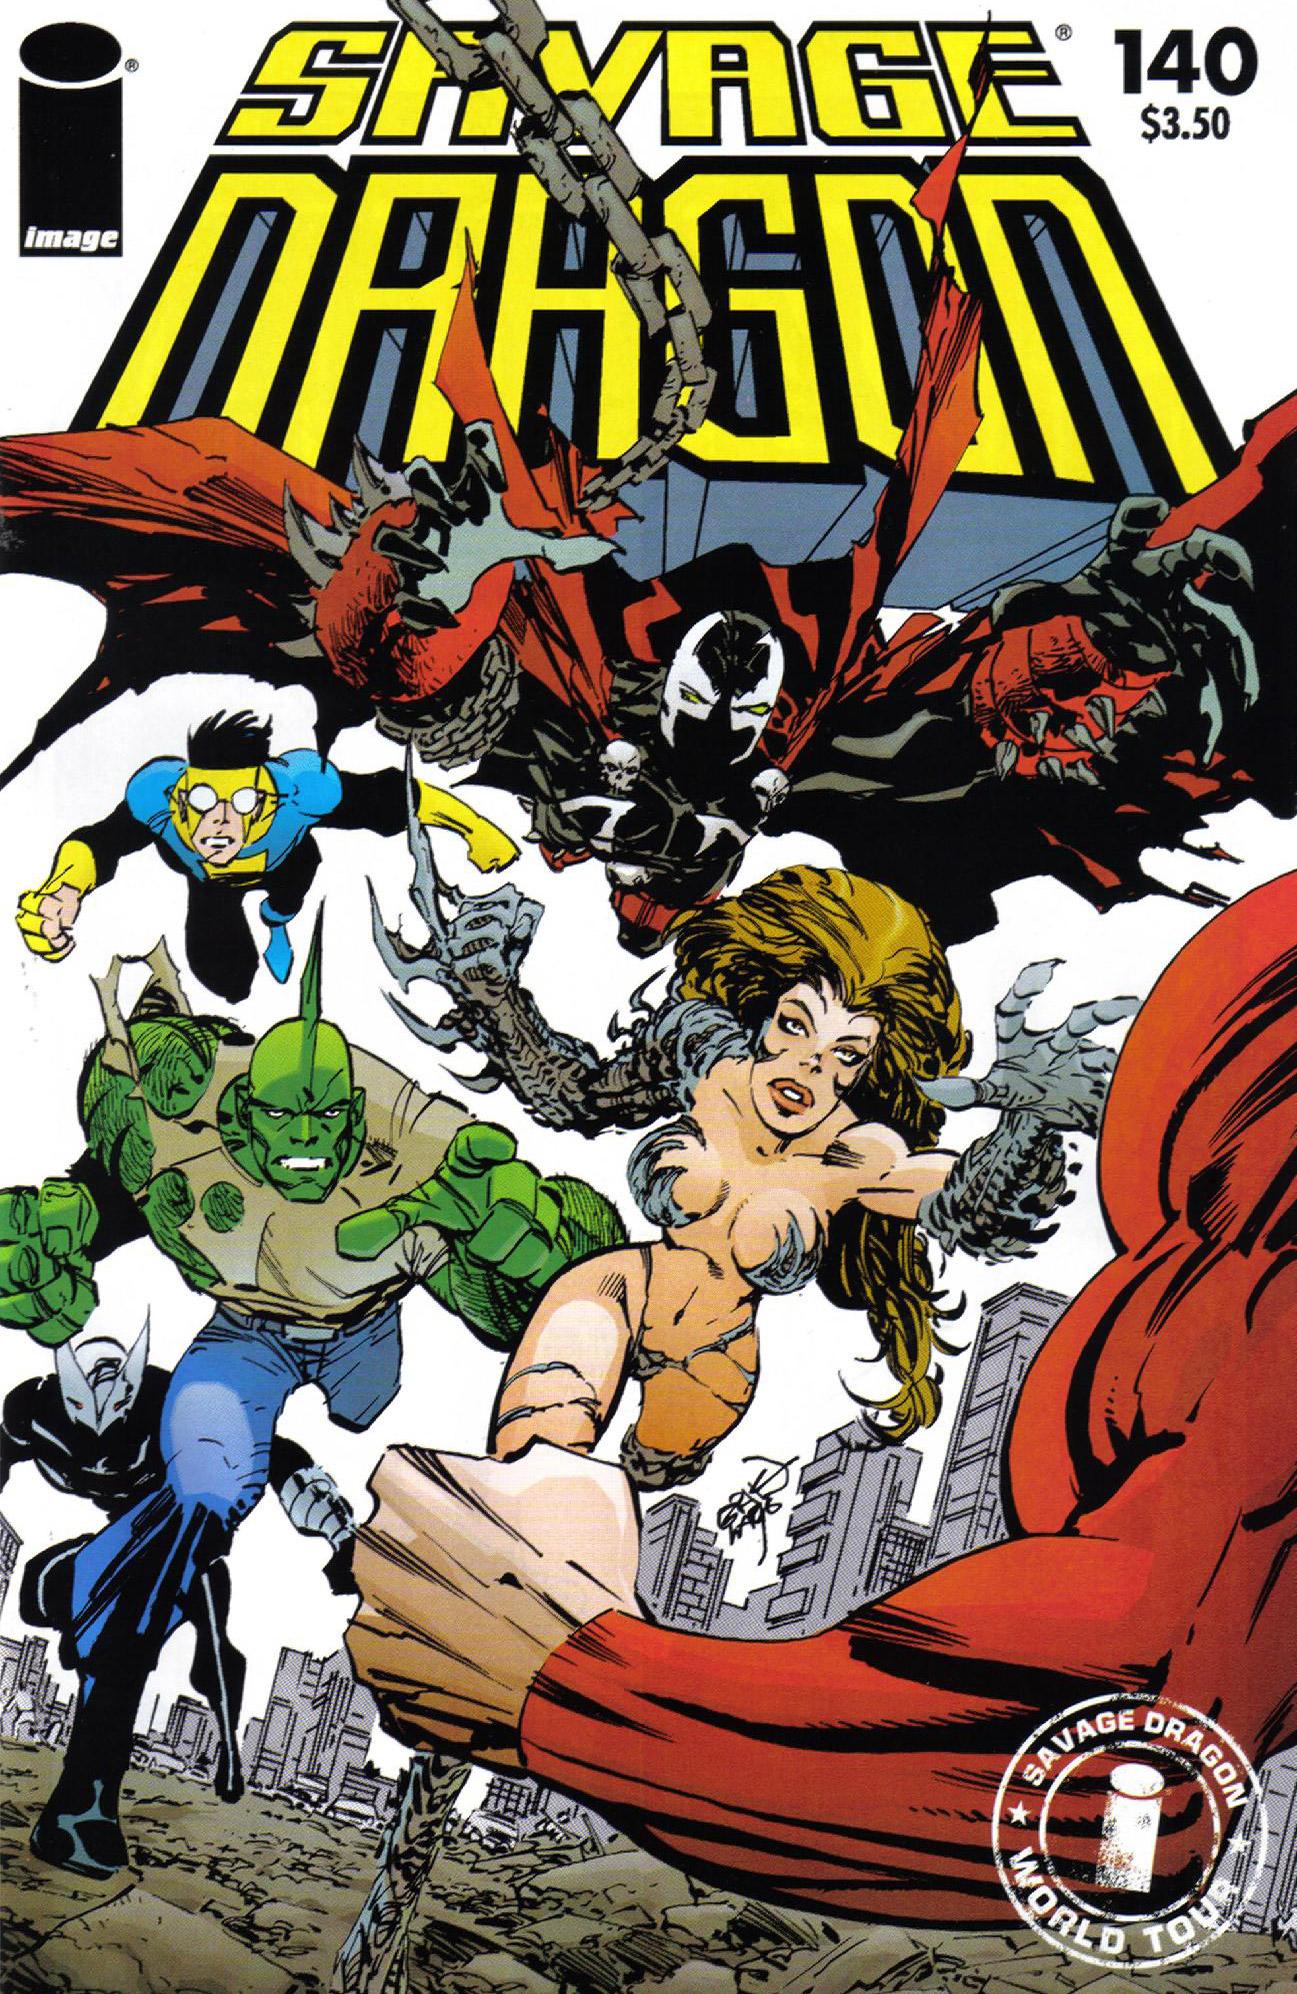 Cover Savage Dragon Vol.2 #140